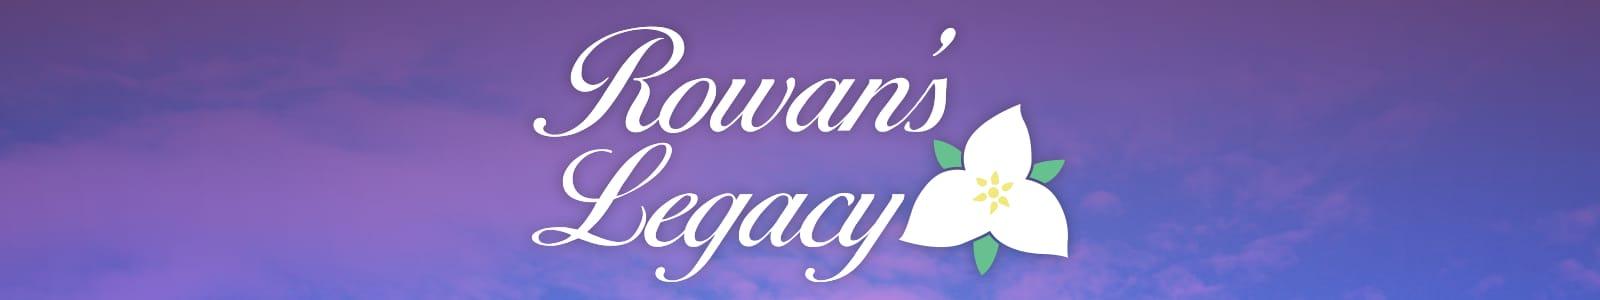 Rowan's Legacy